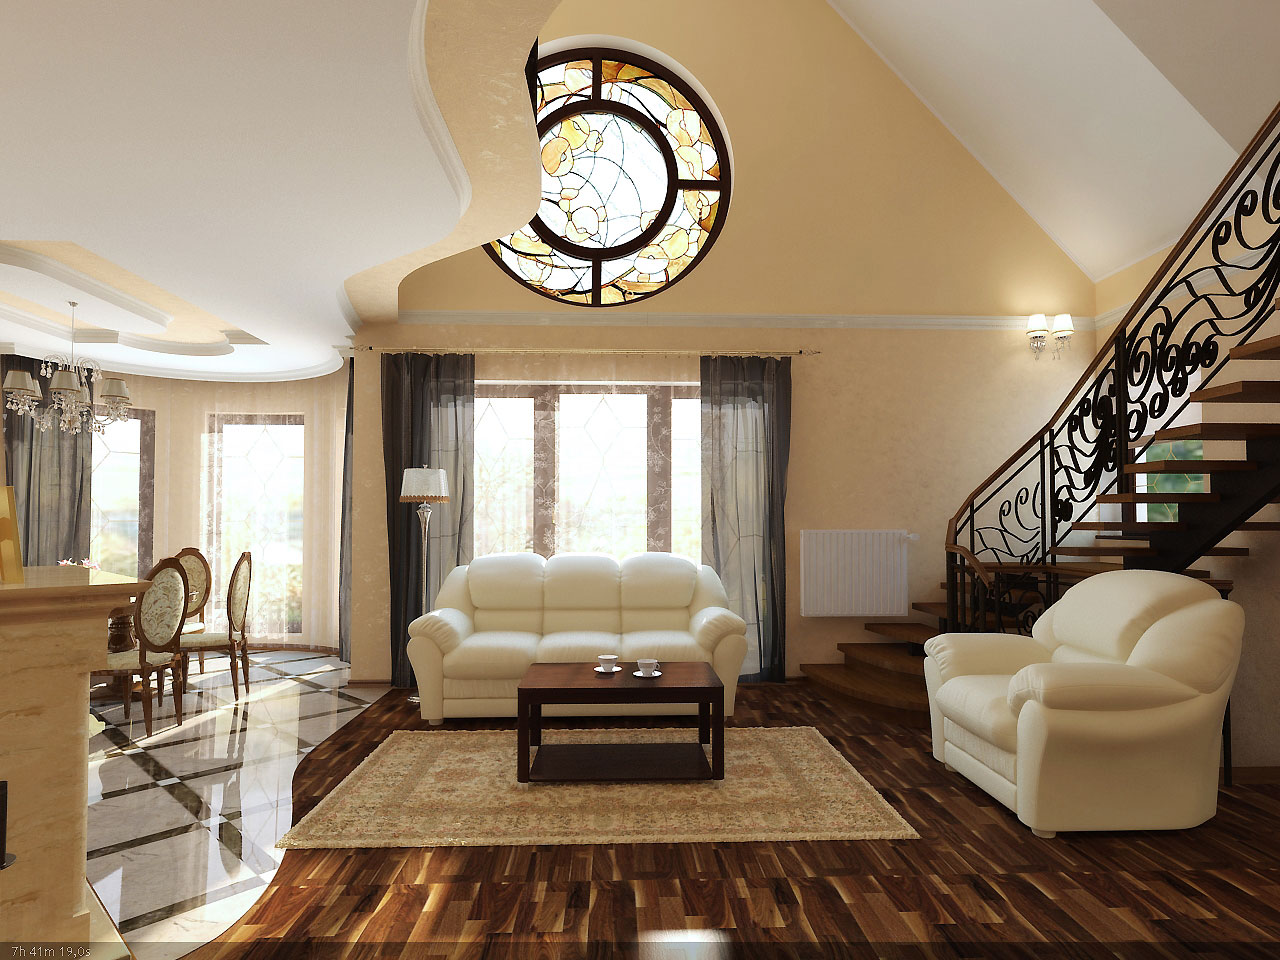 Interior design ideas interior designs home design ideas - Interior decorator qualifications ...